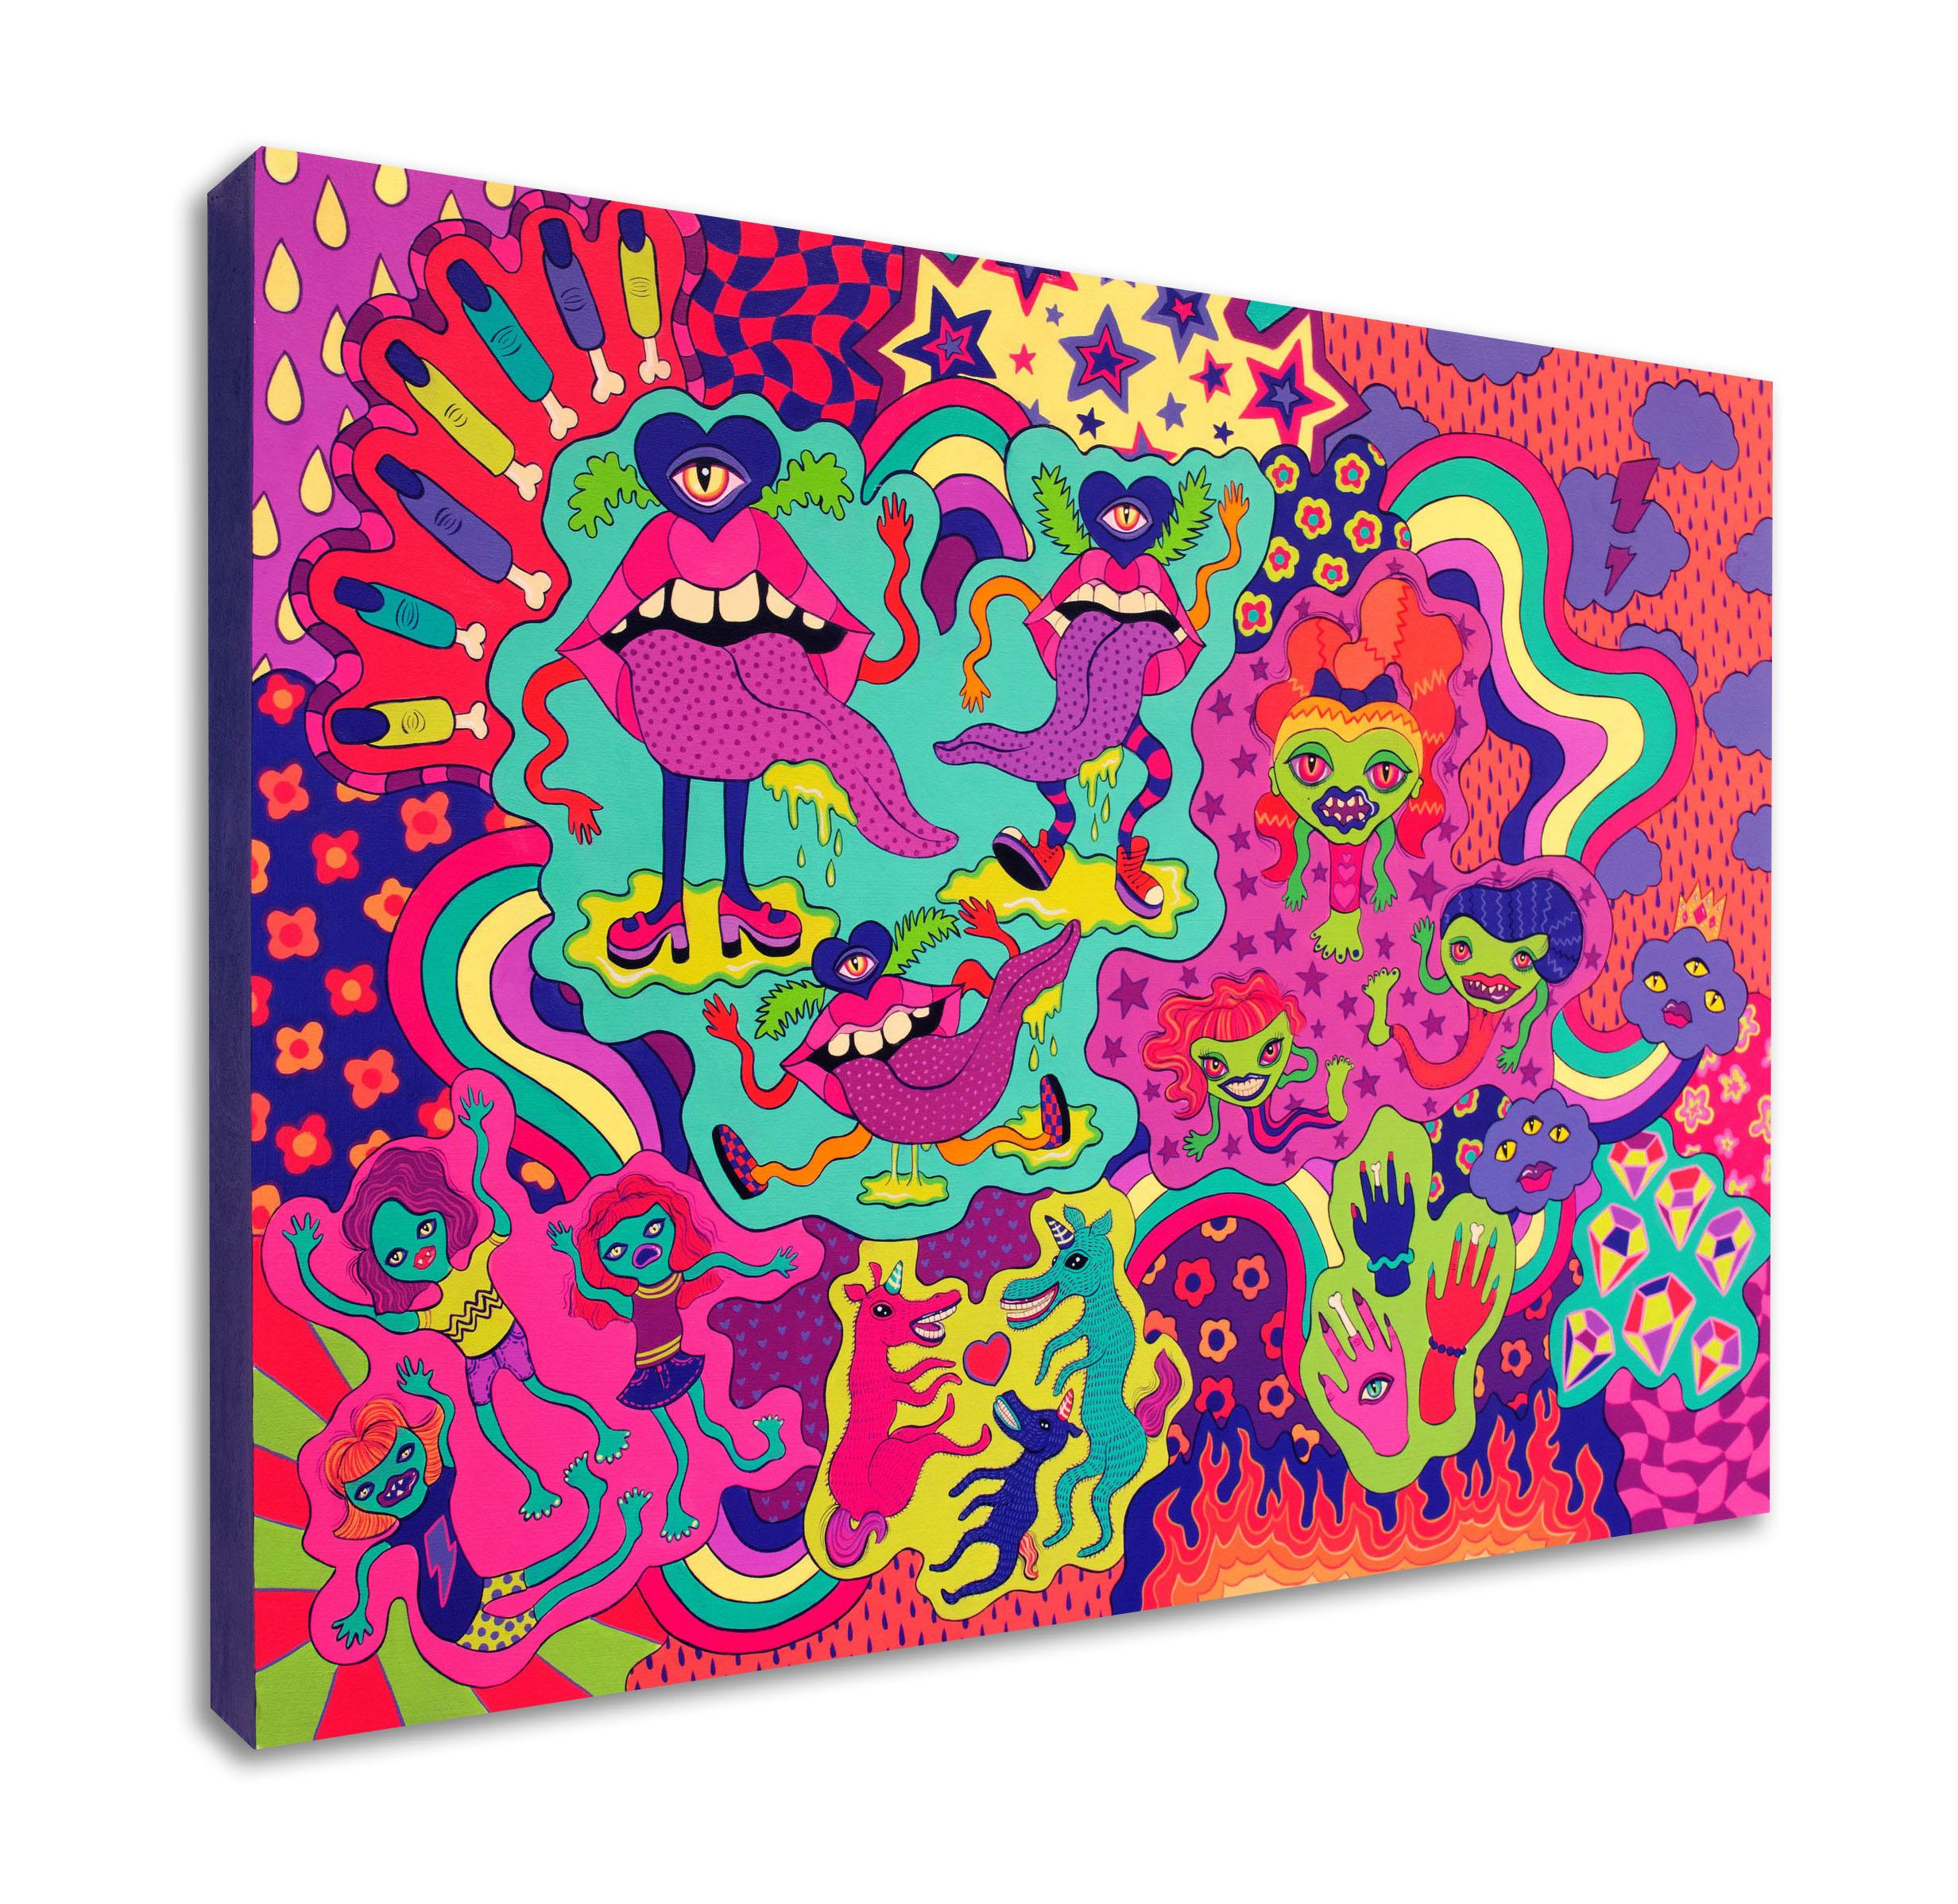 Taste the Rainbow , acrylic on wood panel, 18 x 24 in., 2017